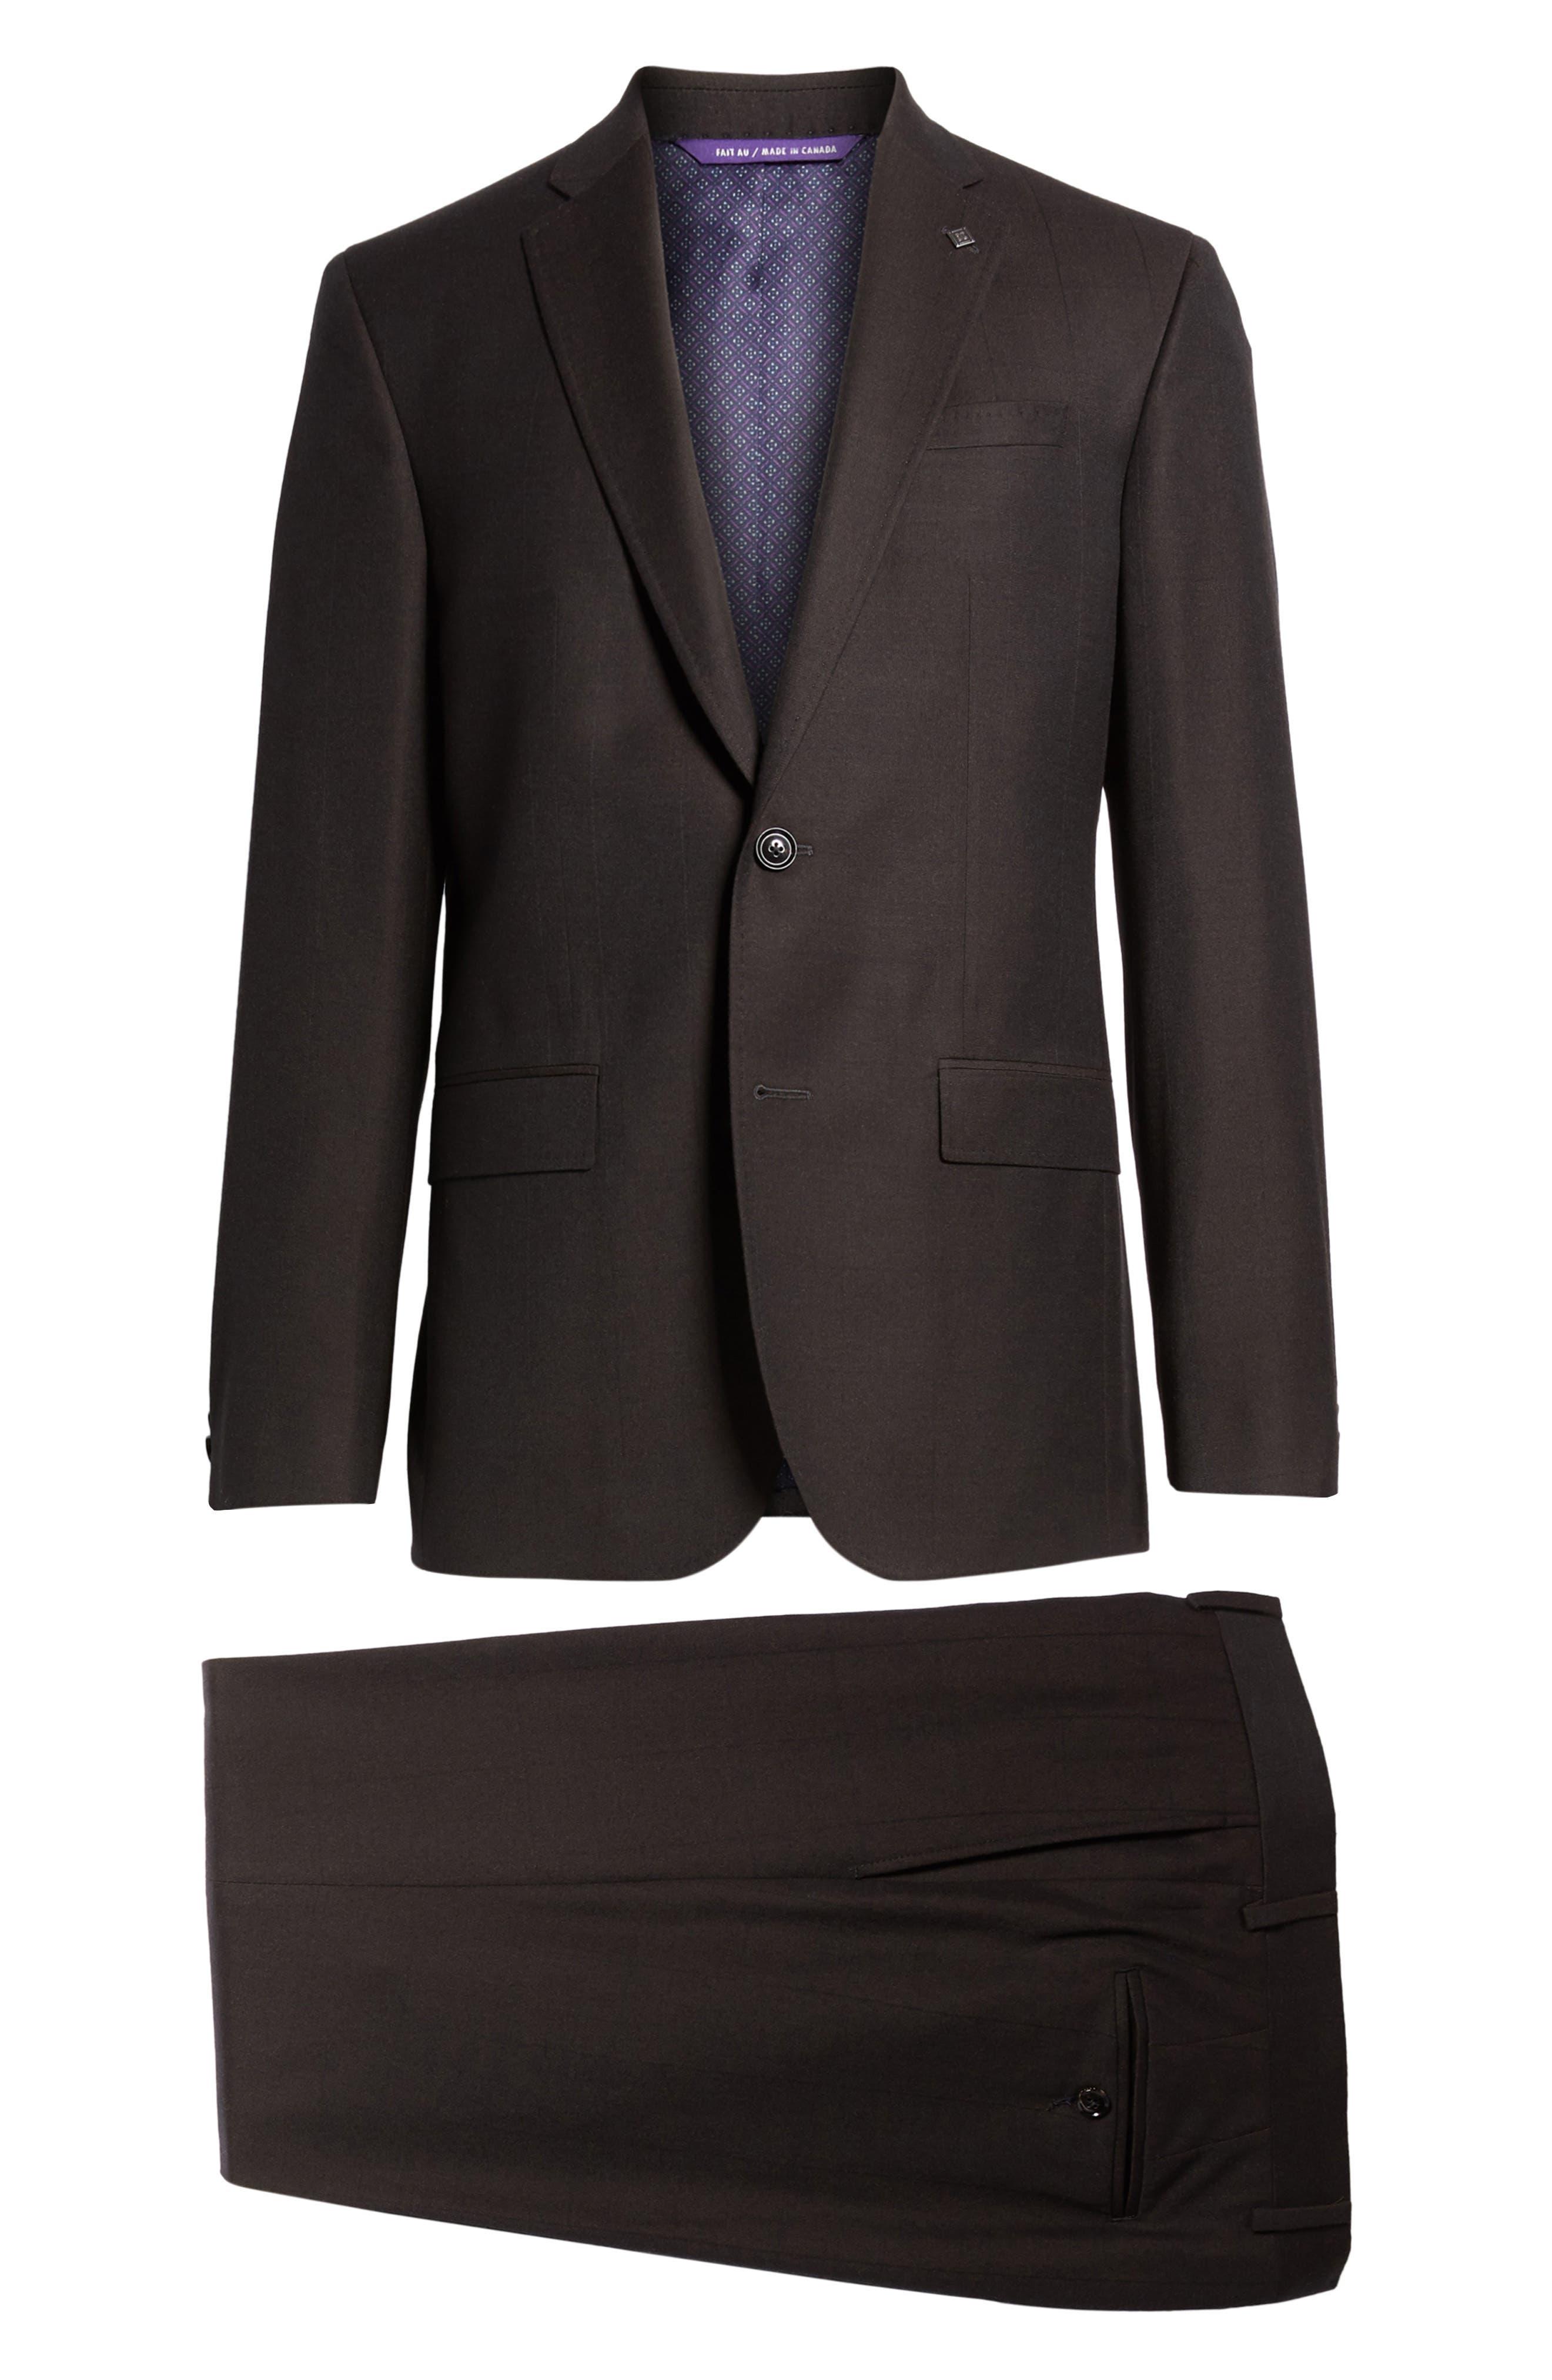 Jay Trim Fit Solid Wool Suit,                             Alternate thumbnail 8, color,                             200